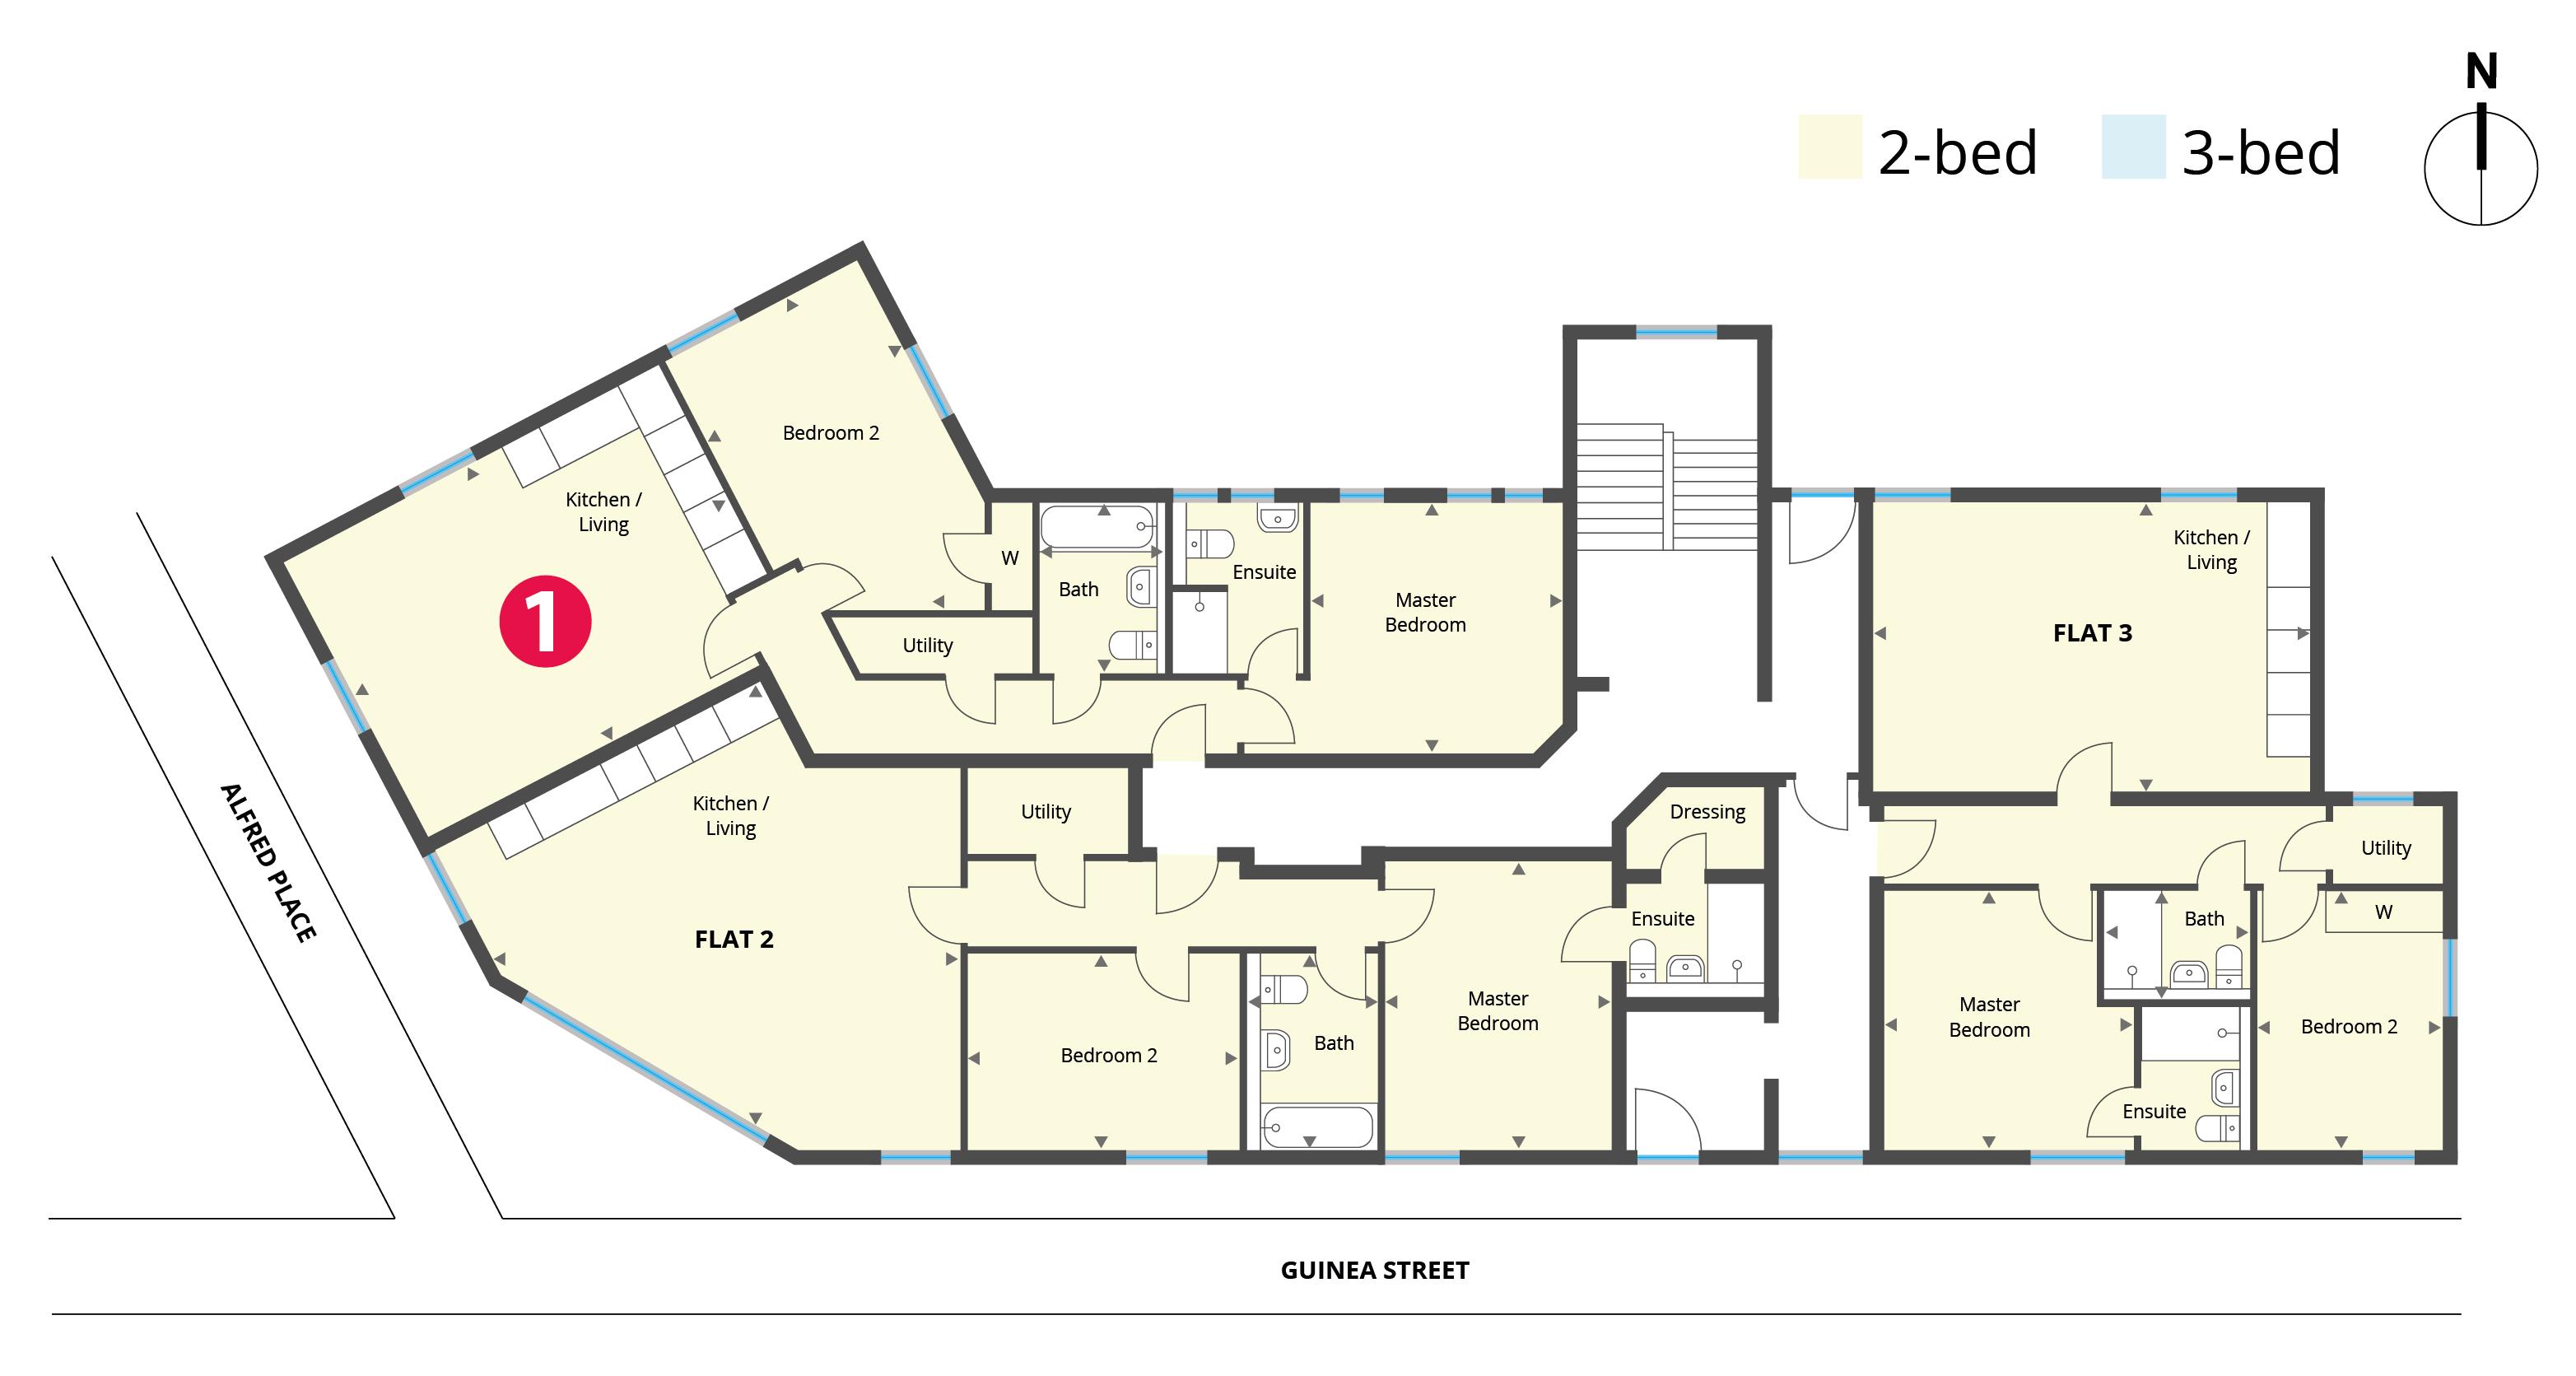 Floorplan for Flat 1